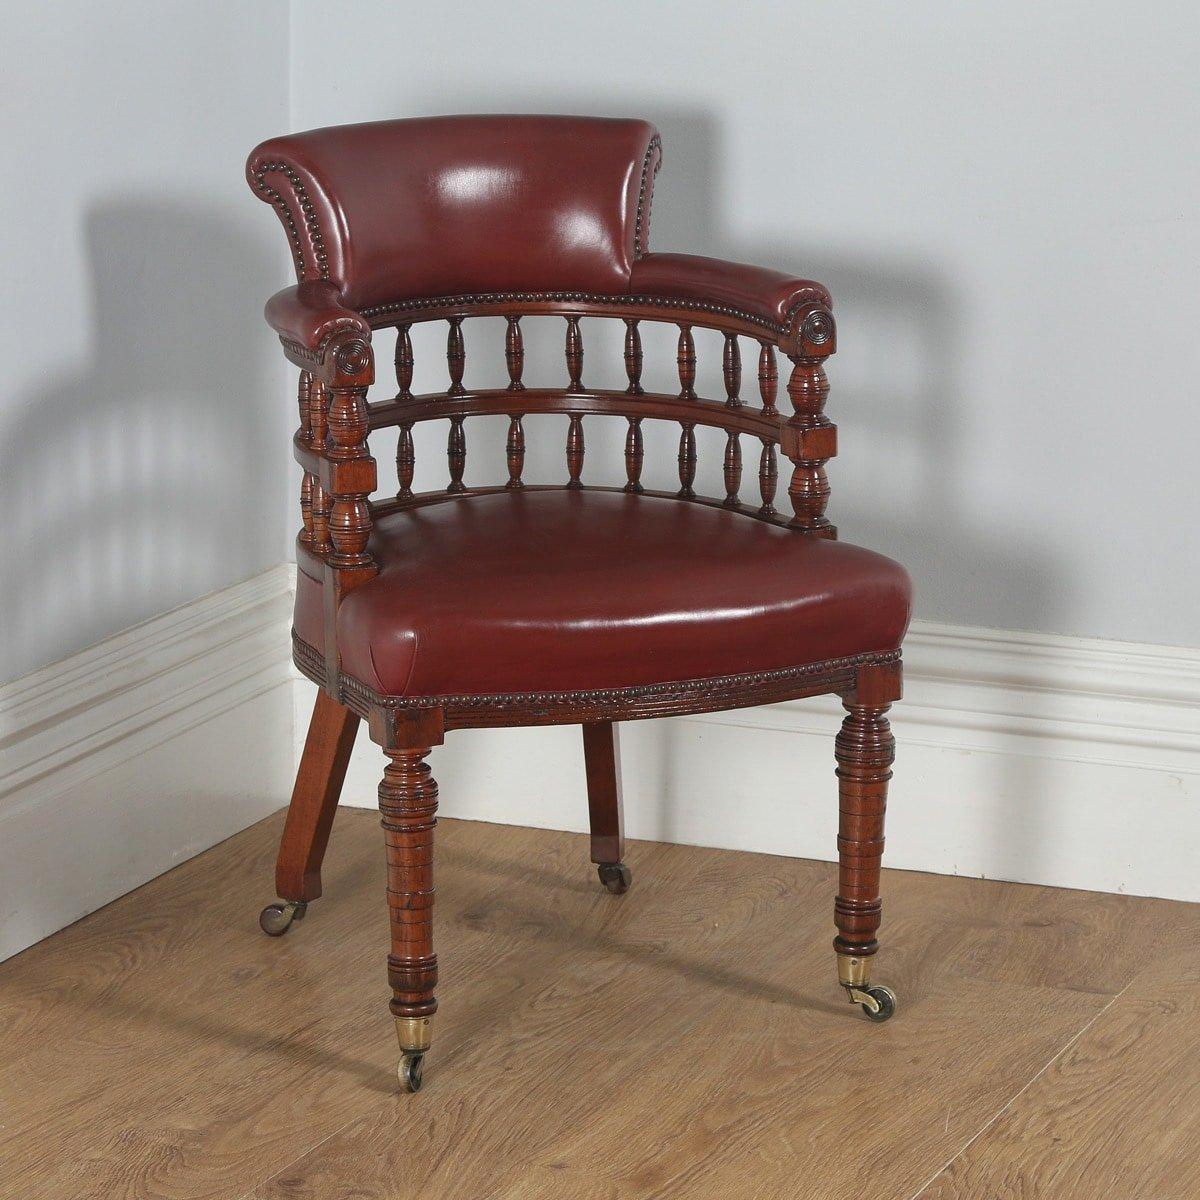 Antique English Victorian Walnut Burgundy Red Leather Office Desk Arm Chair (Circa 1880)- yolagray.com